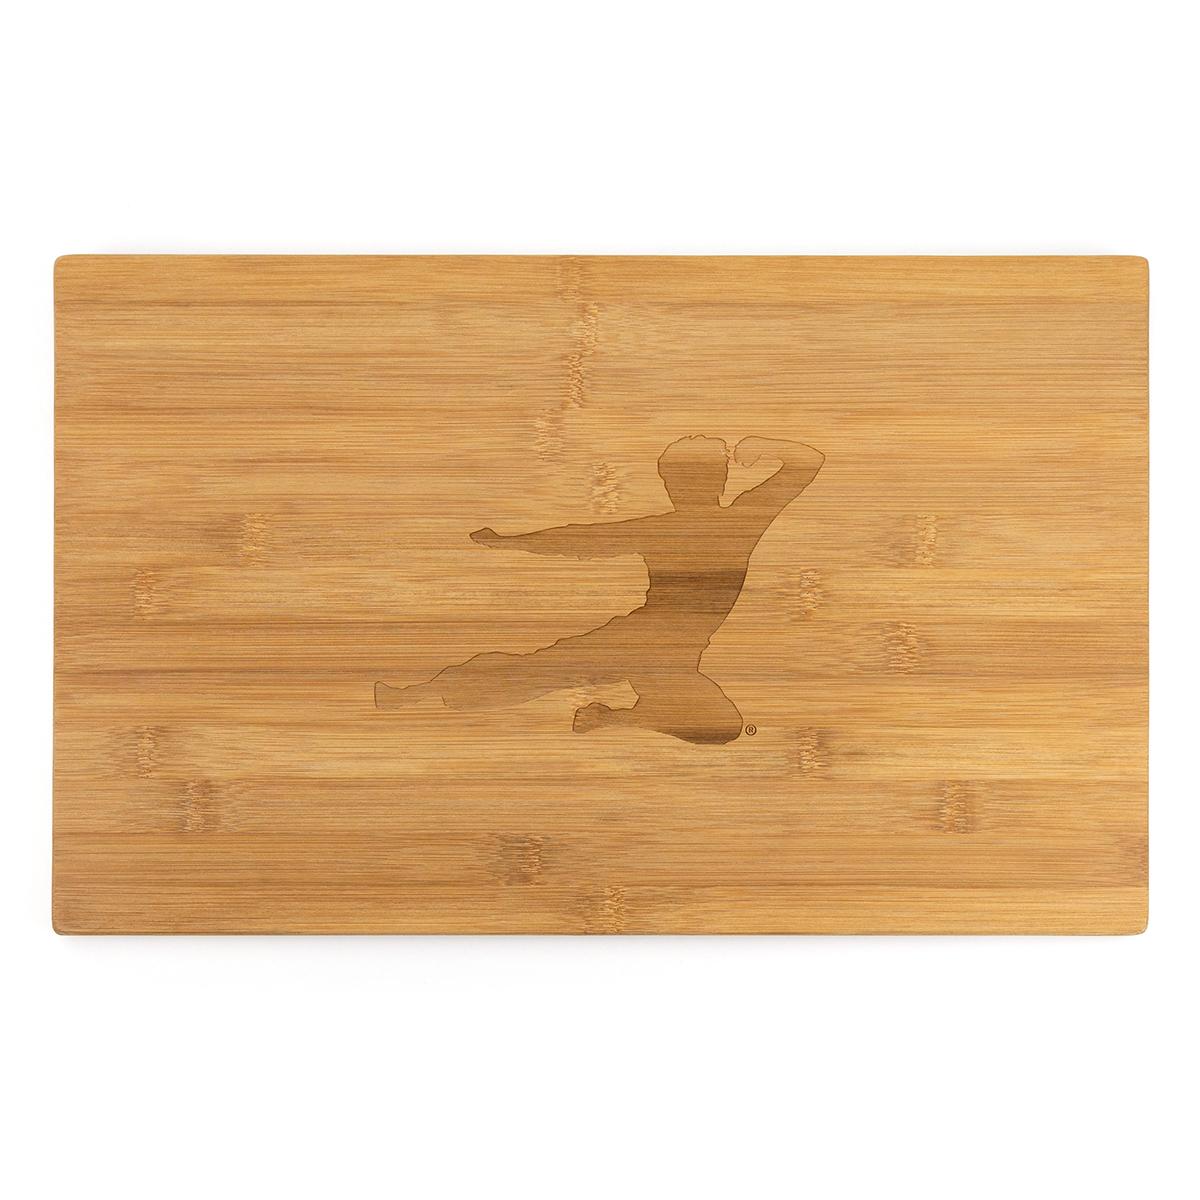 Flying Man Bamboo Cutting Board